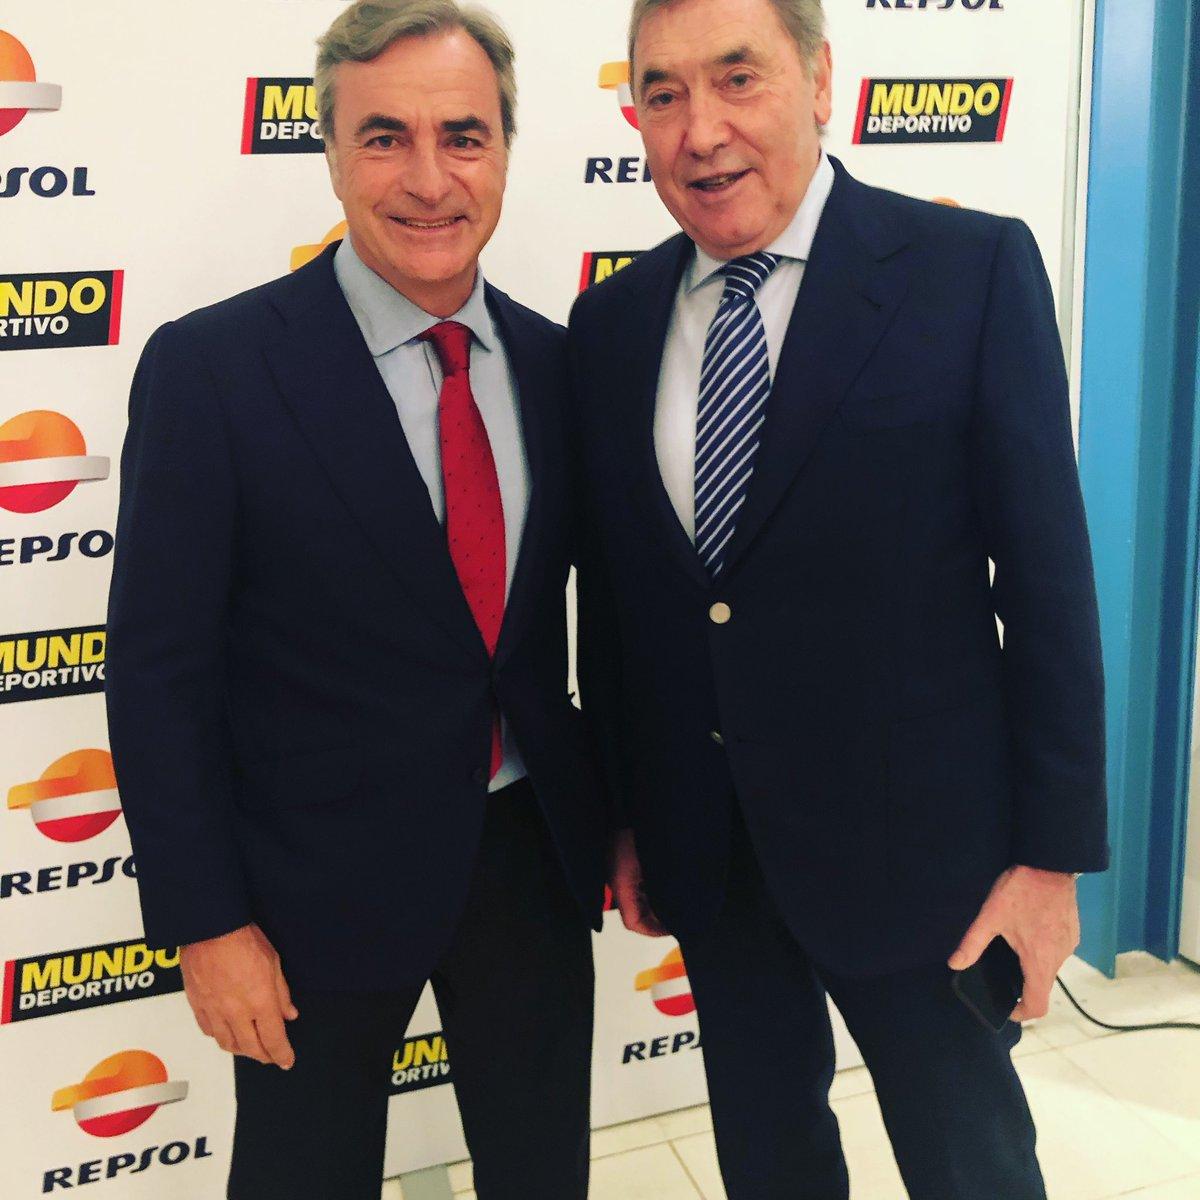 ¿Cuánto mide Eddie Merckx? - Real height DyELNYKW0AAcq-D